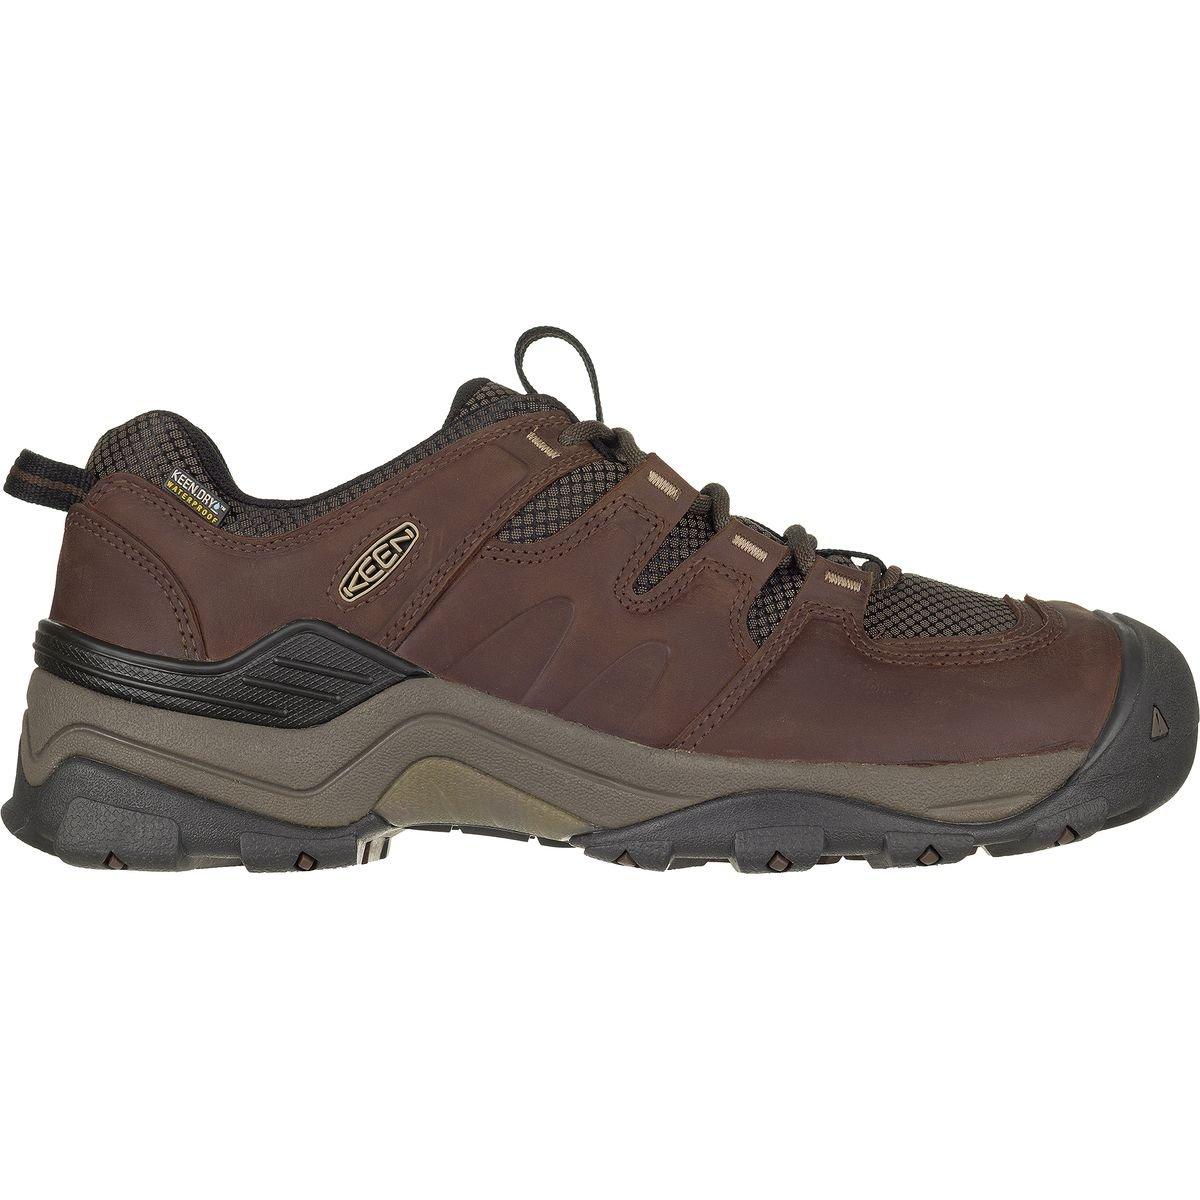 KEEN Men's Gypsum Ii Wp-m Backpacking Boot, Grand Canyon/Dark Earth, 7.5 M US